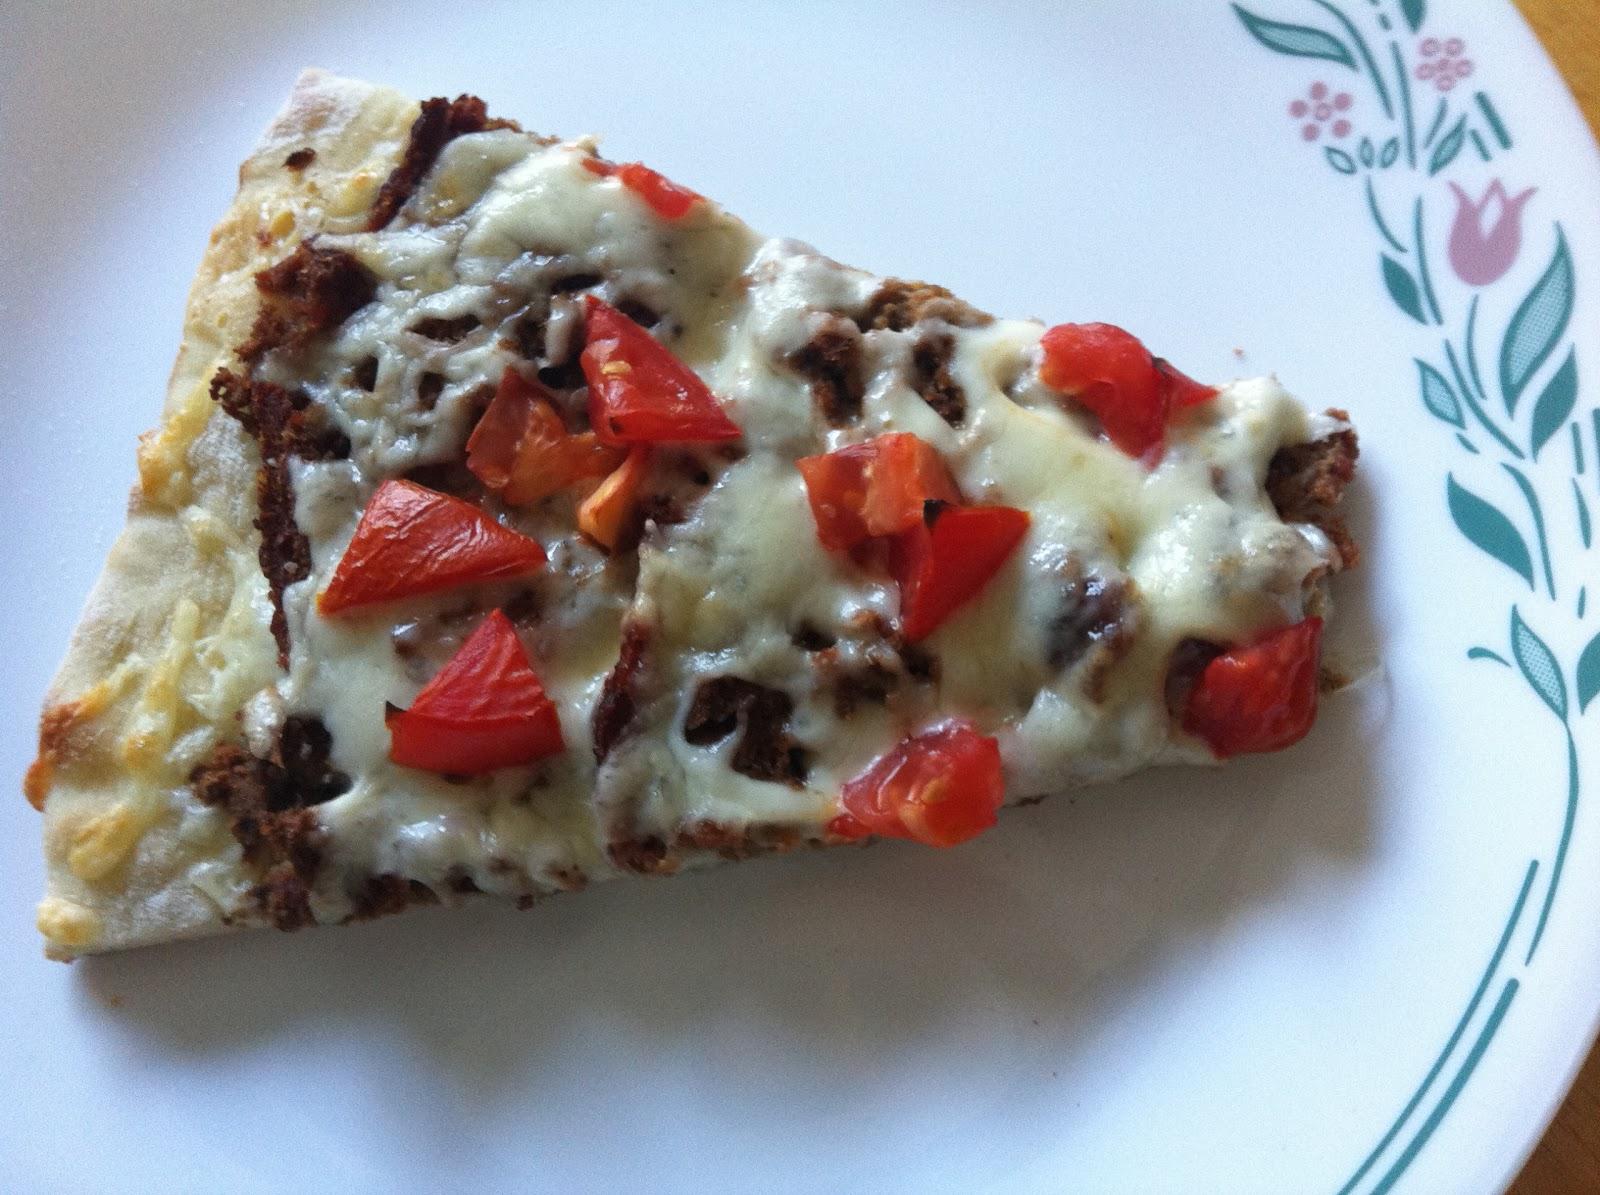 Kamado Joe Grilling Passion Donair Pizza A Nova Scotia Staple